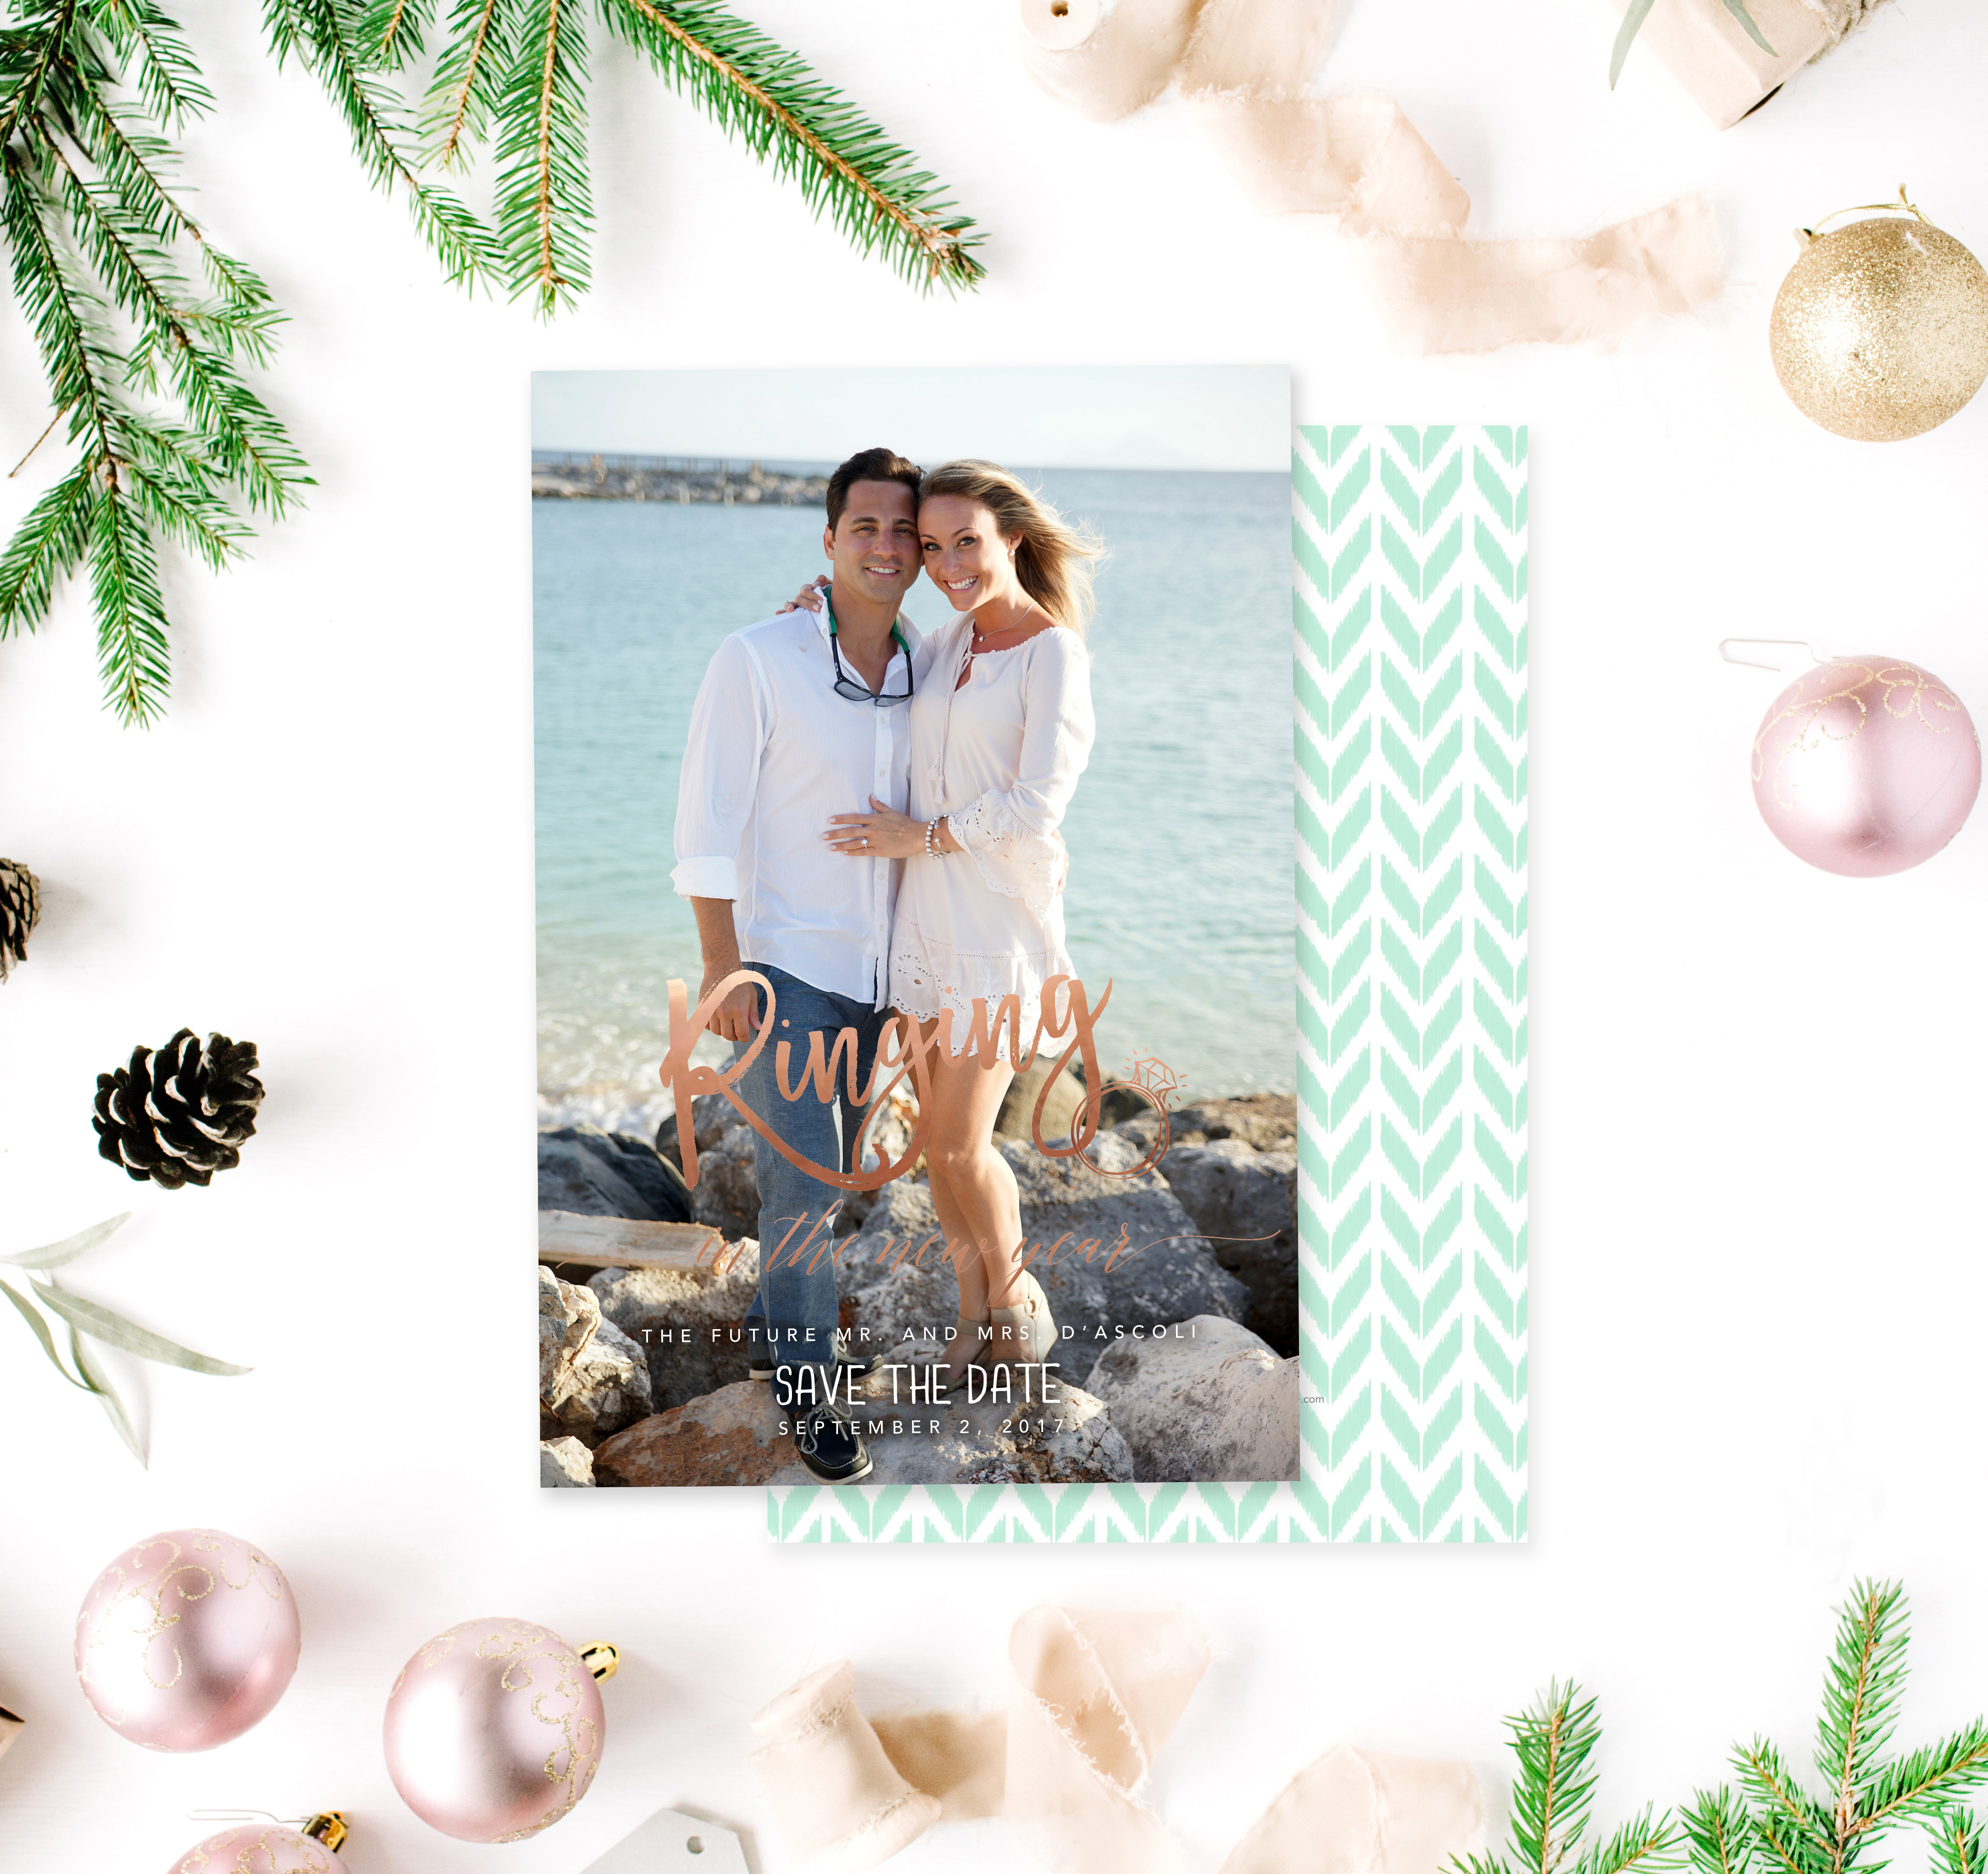 newlywed holiday card ringing in new year